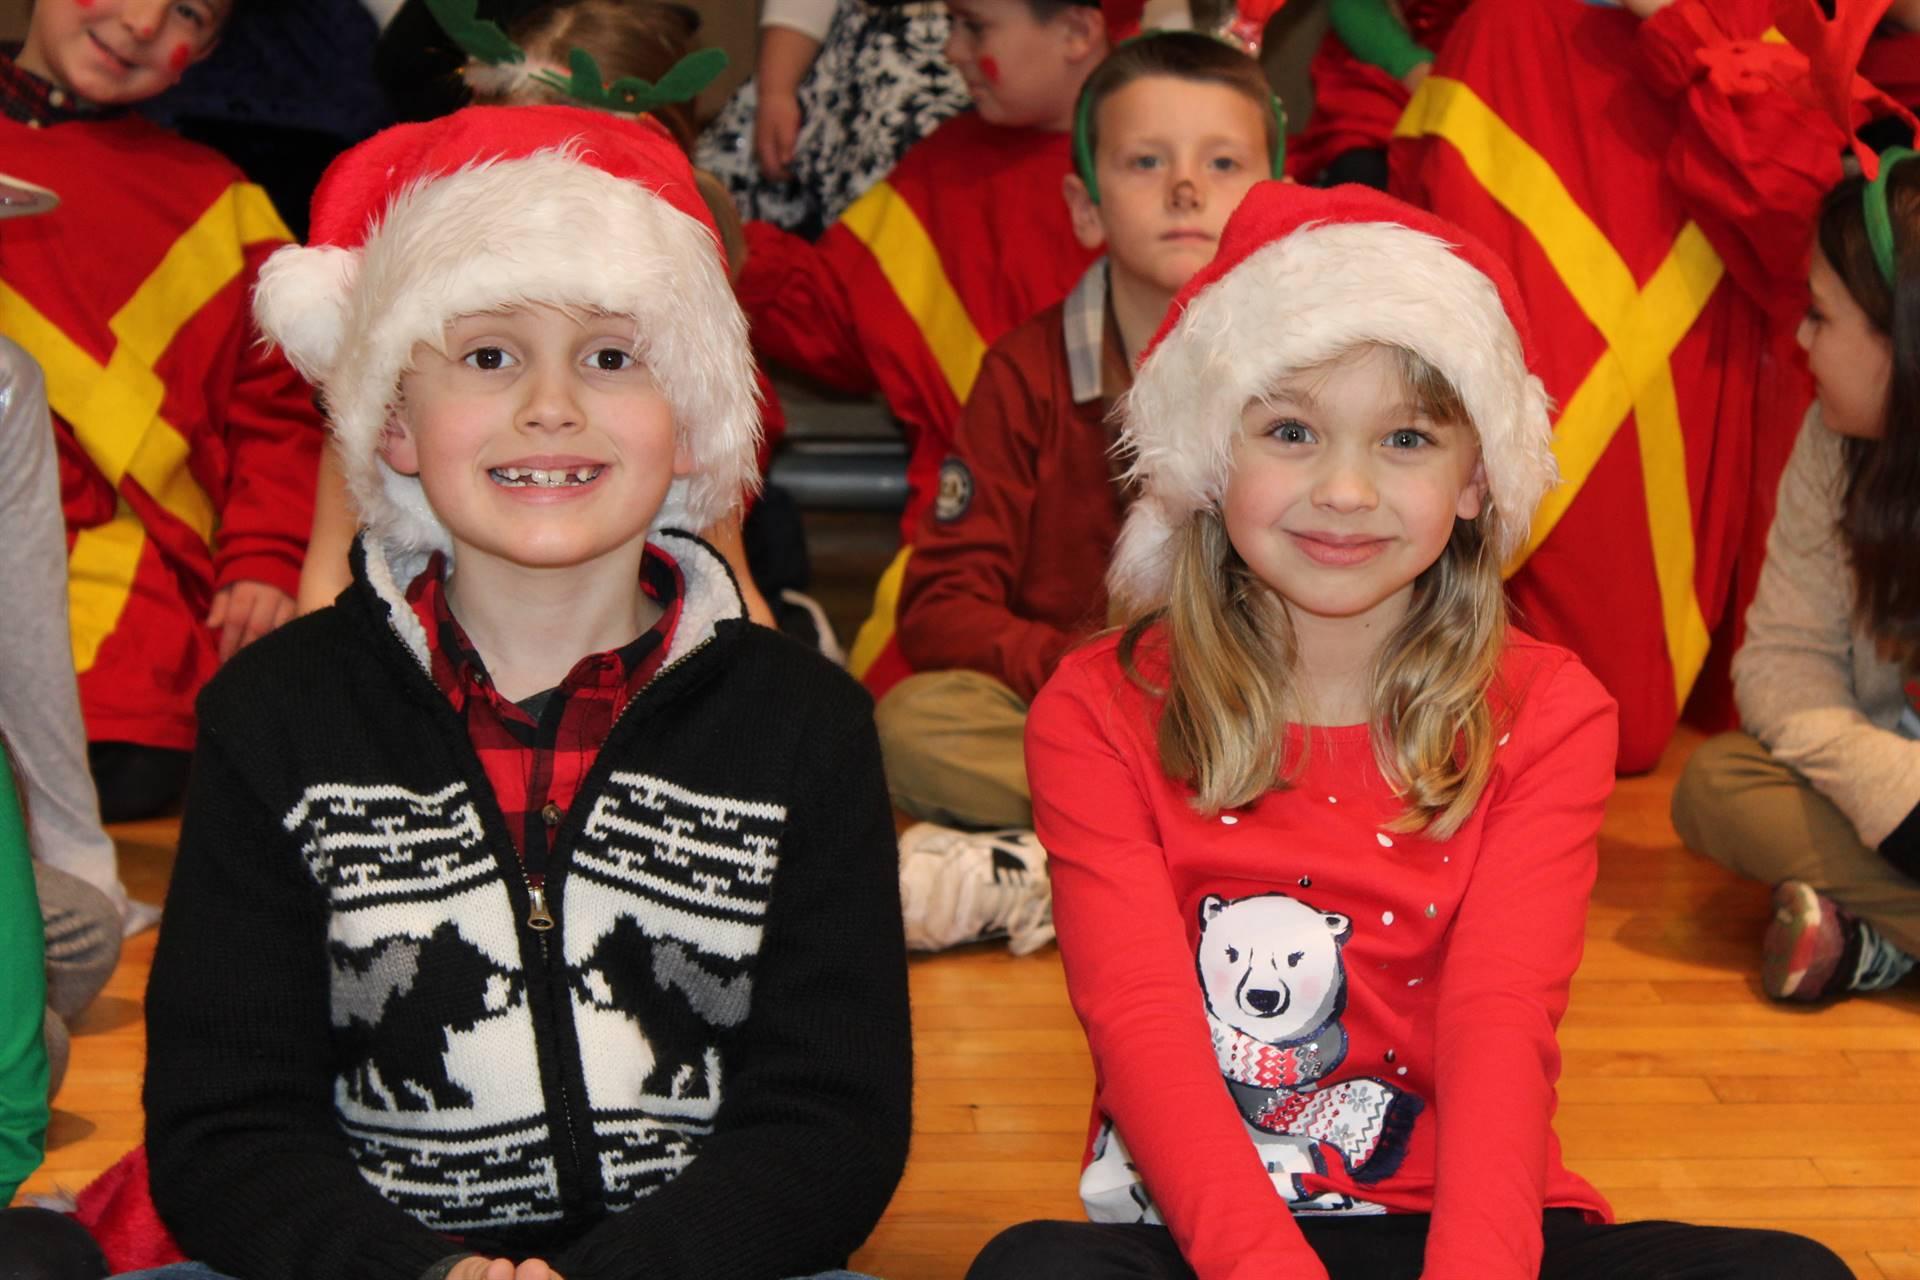 two students wearing Santa hats